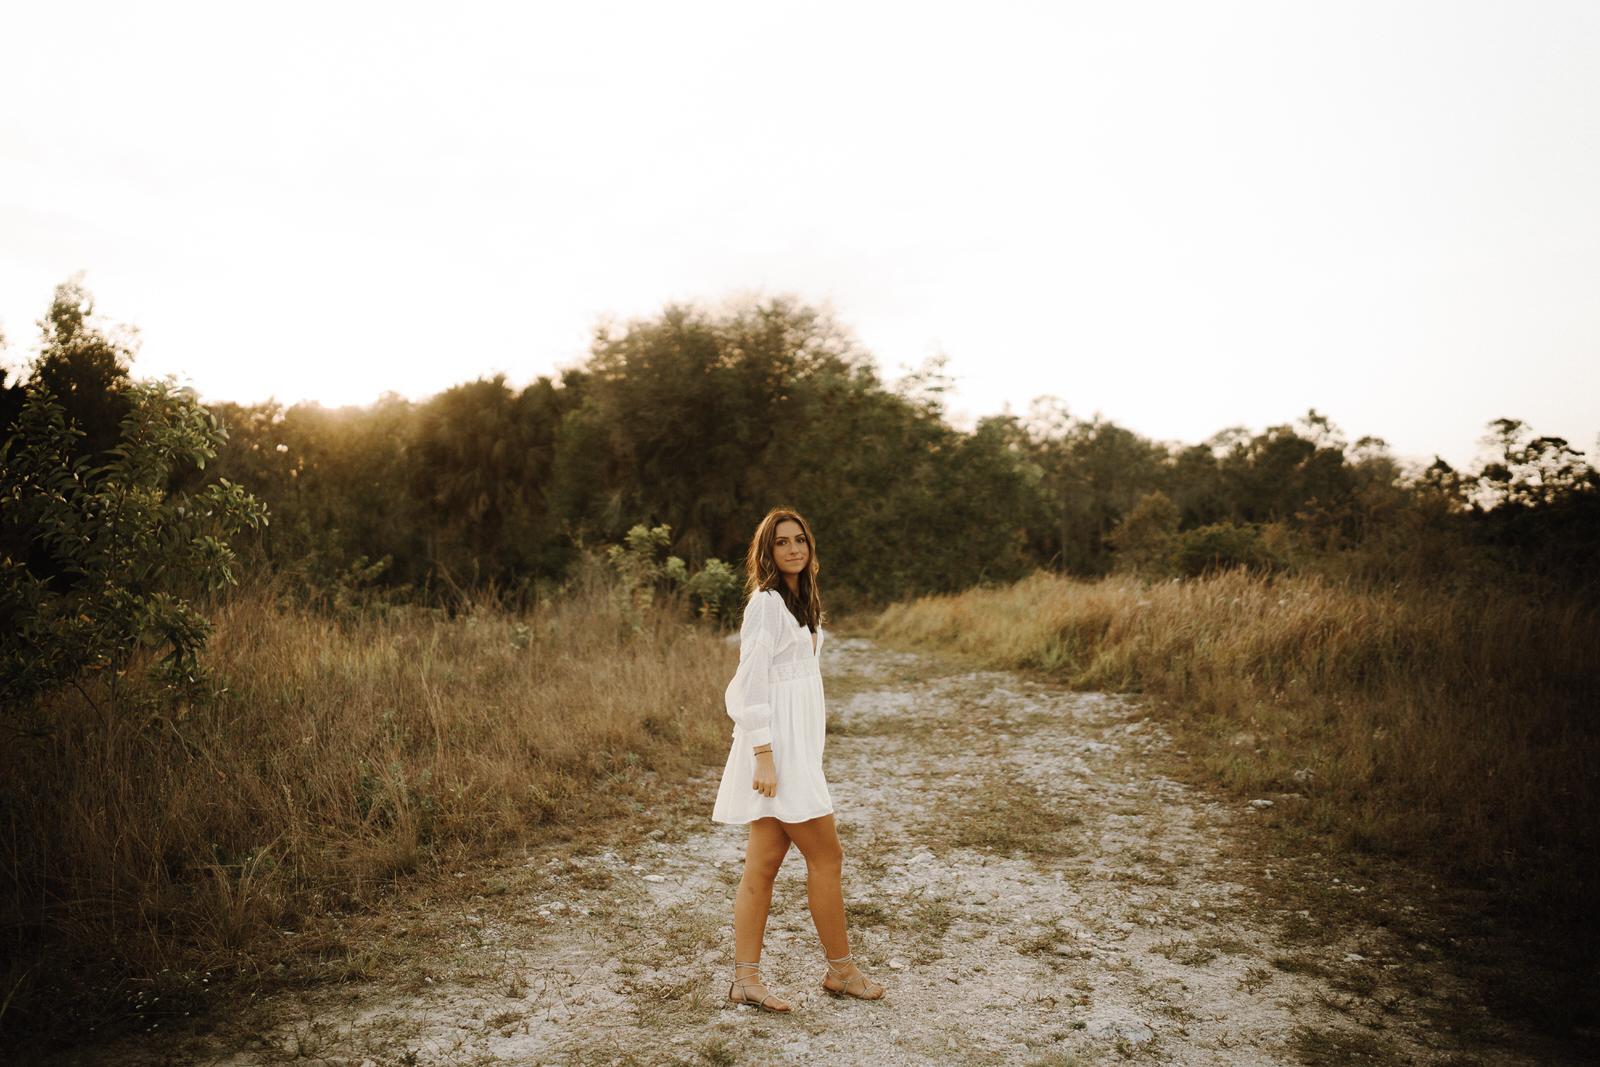 Fort Myers Senior Photos- Michelle Gonzalez Photography- Kate McQuagge-107.JPG